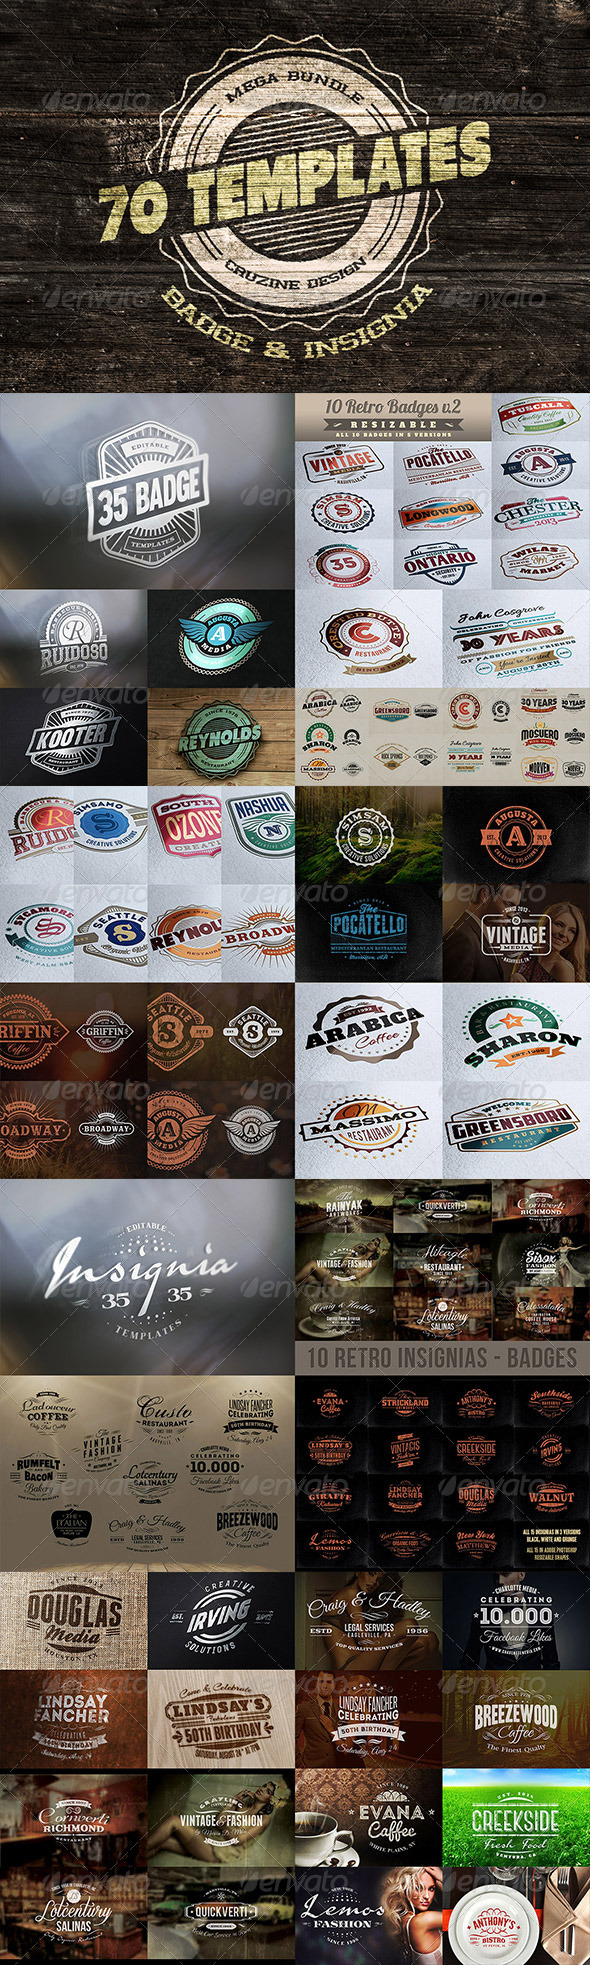 Logo / Badge / Insignia Templates Bundle Free Download #1 free download Logo / Badge / Insignia Templates Bundle Free Download #1 nulled Logo / Badge / Insignia Templates Bundle Free Download #1